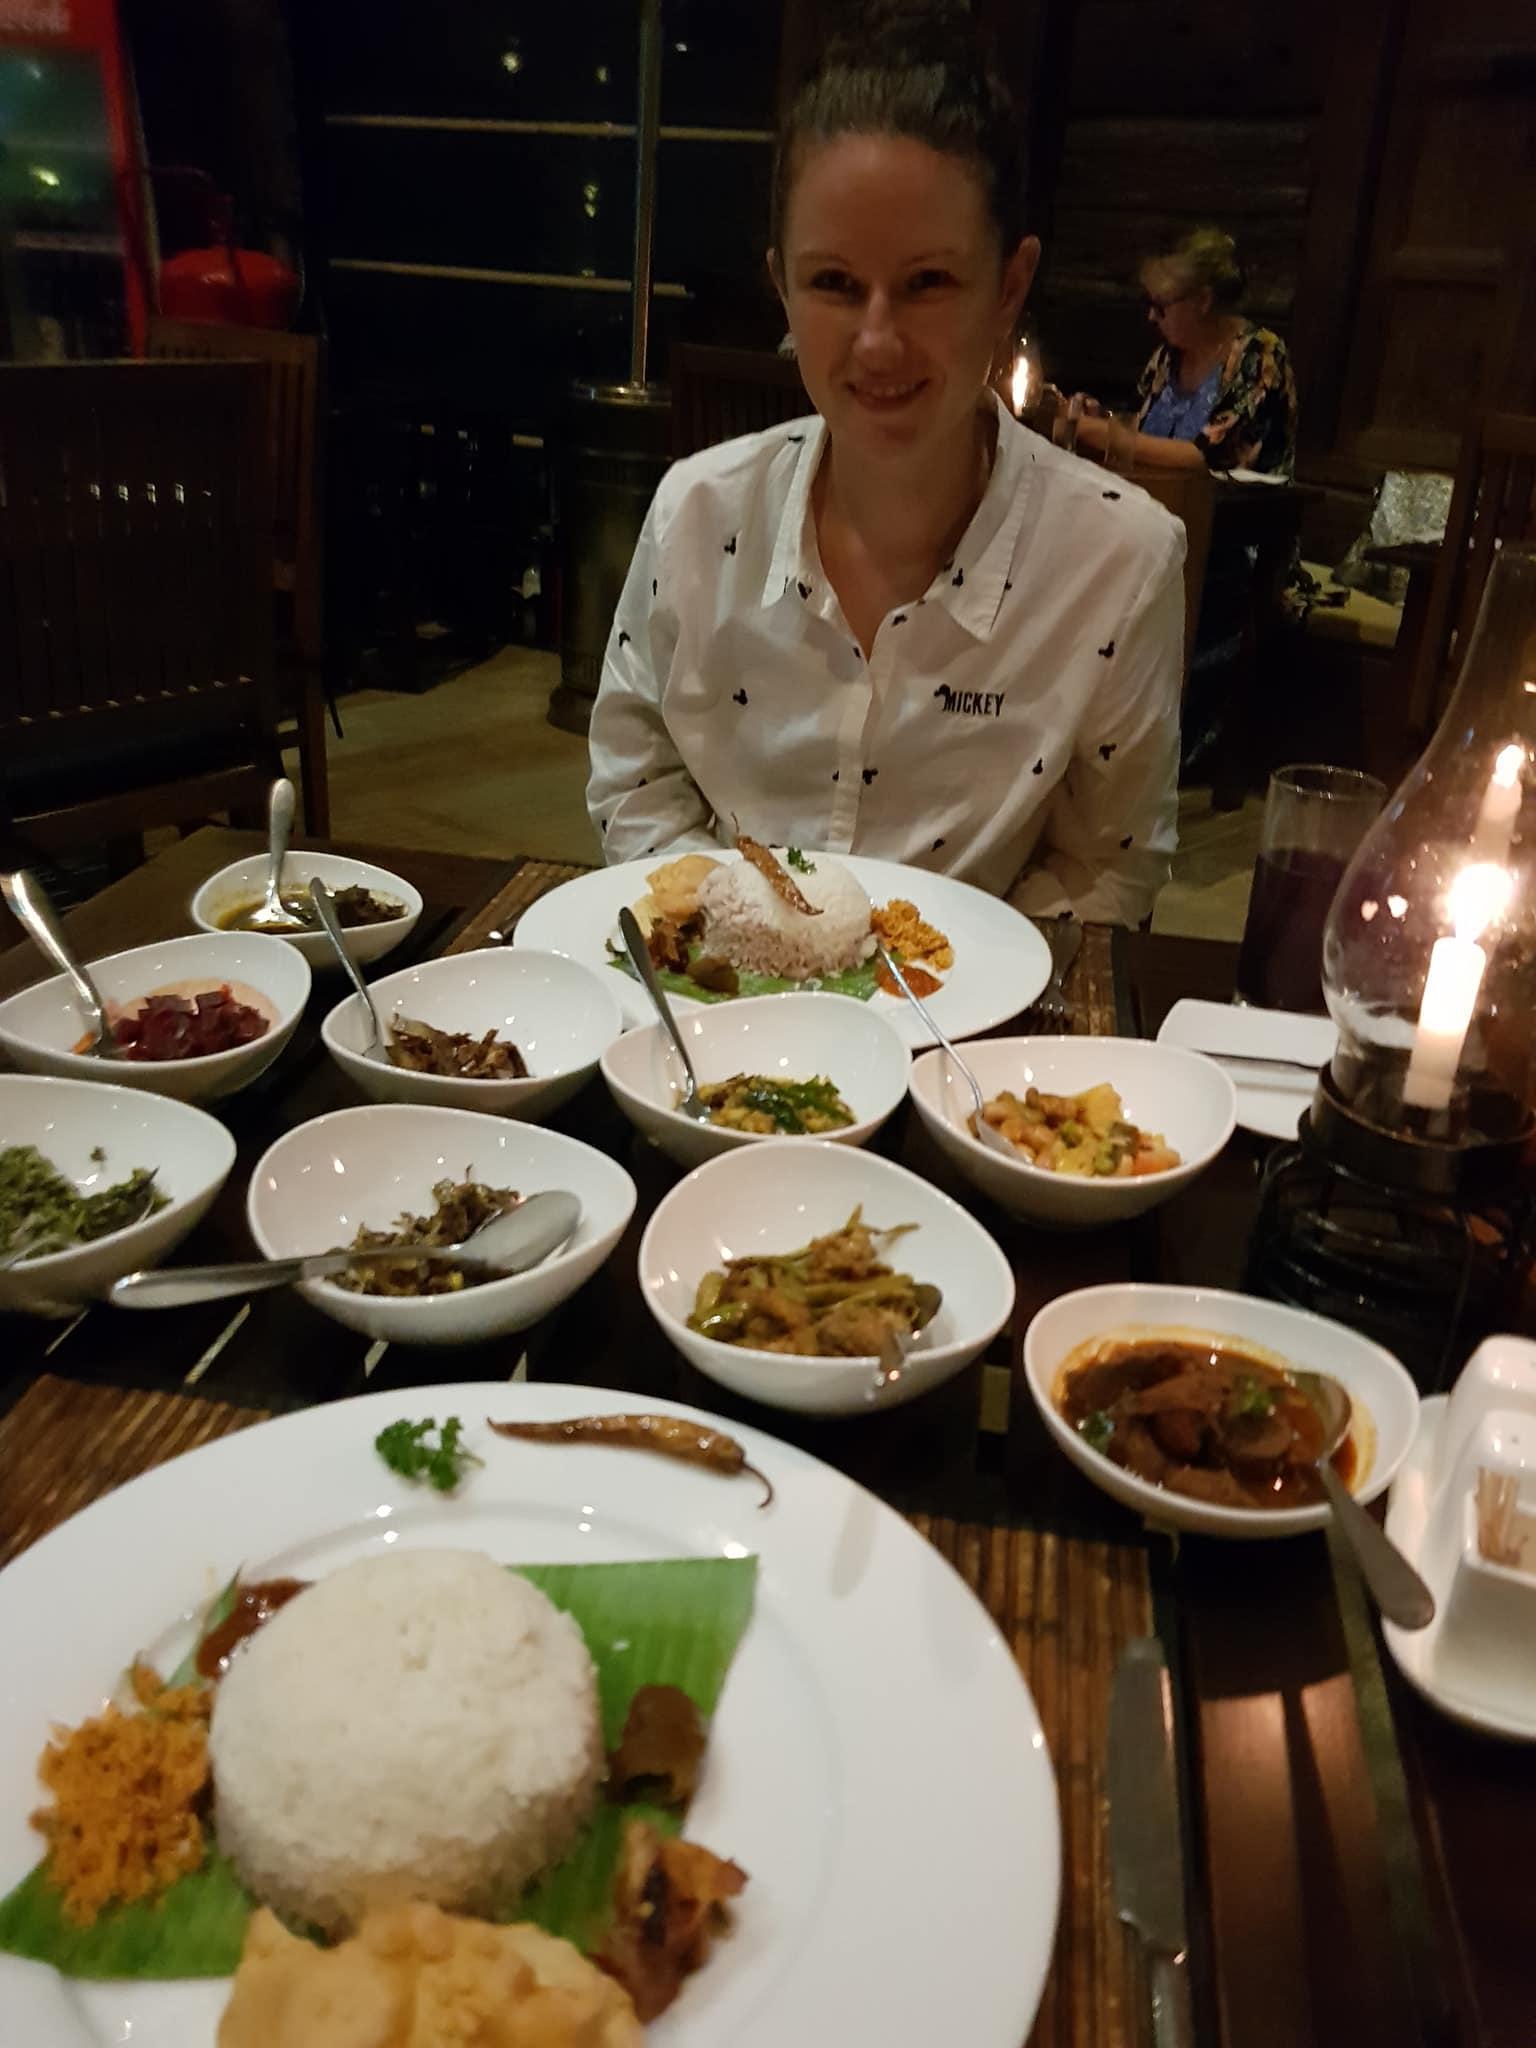 invite-to-paradise-sri-lanka-maldives-holiday-honeymoon-specialists-customer-guest-feedback-zane-lisa-butcher-98-acres-tea-plantation-ella-restaruatn-dinner-rice-and-curry.jpg